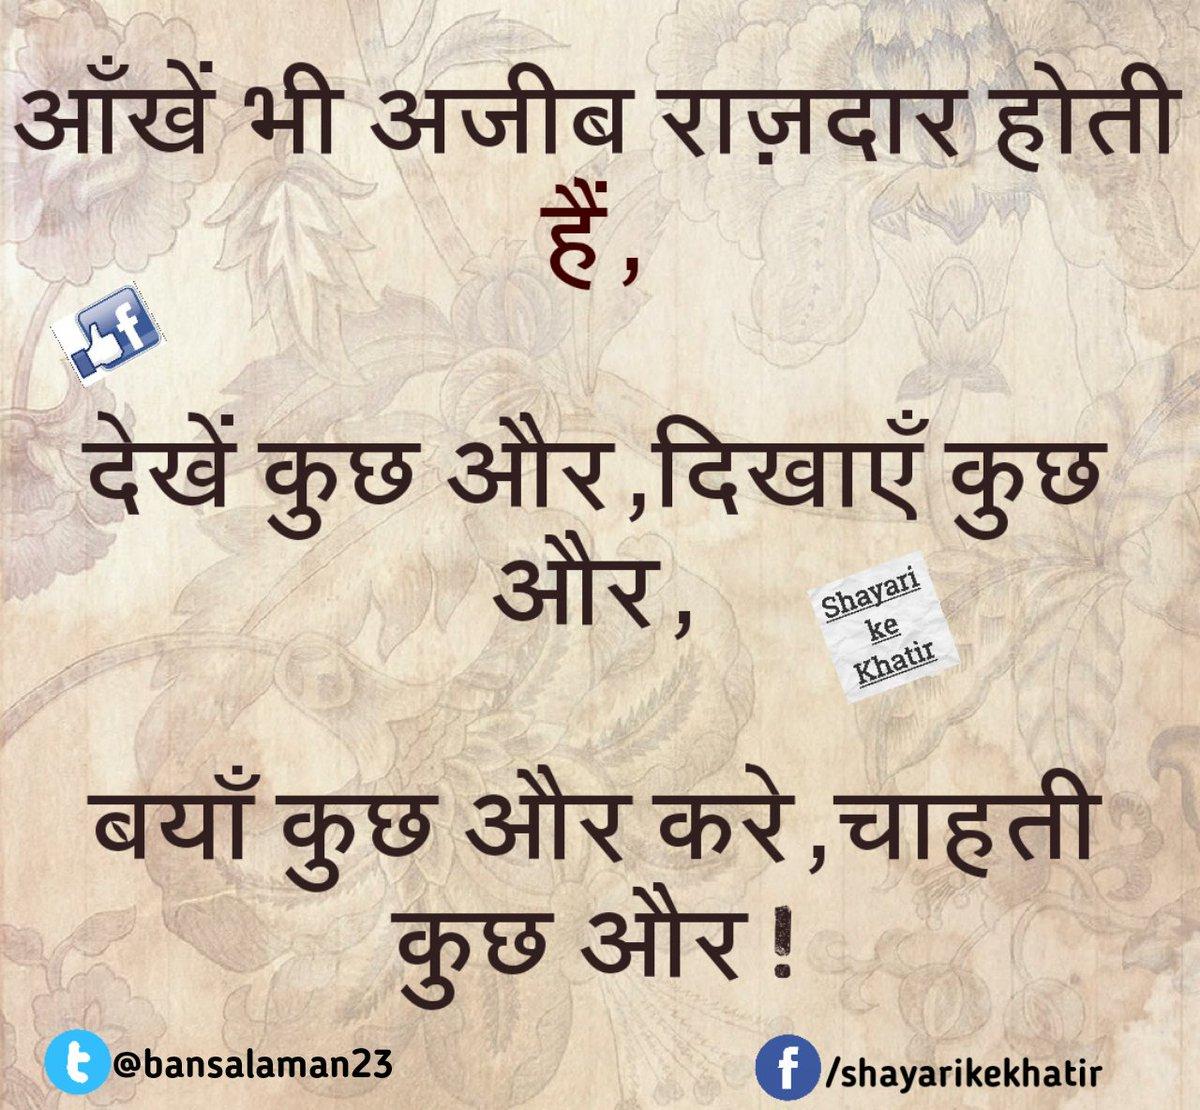 Aman Bansal on Twitter: